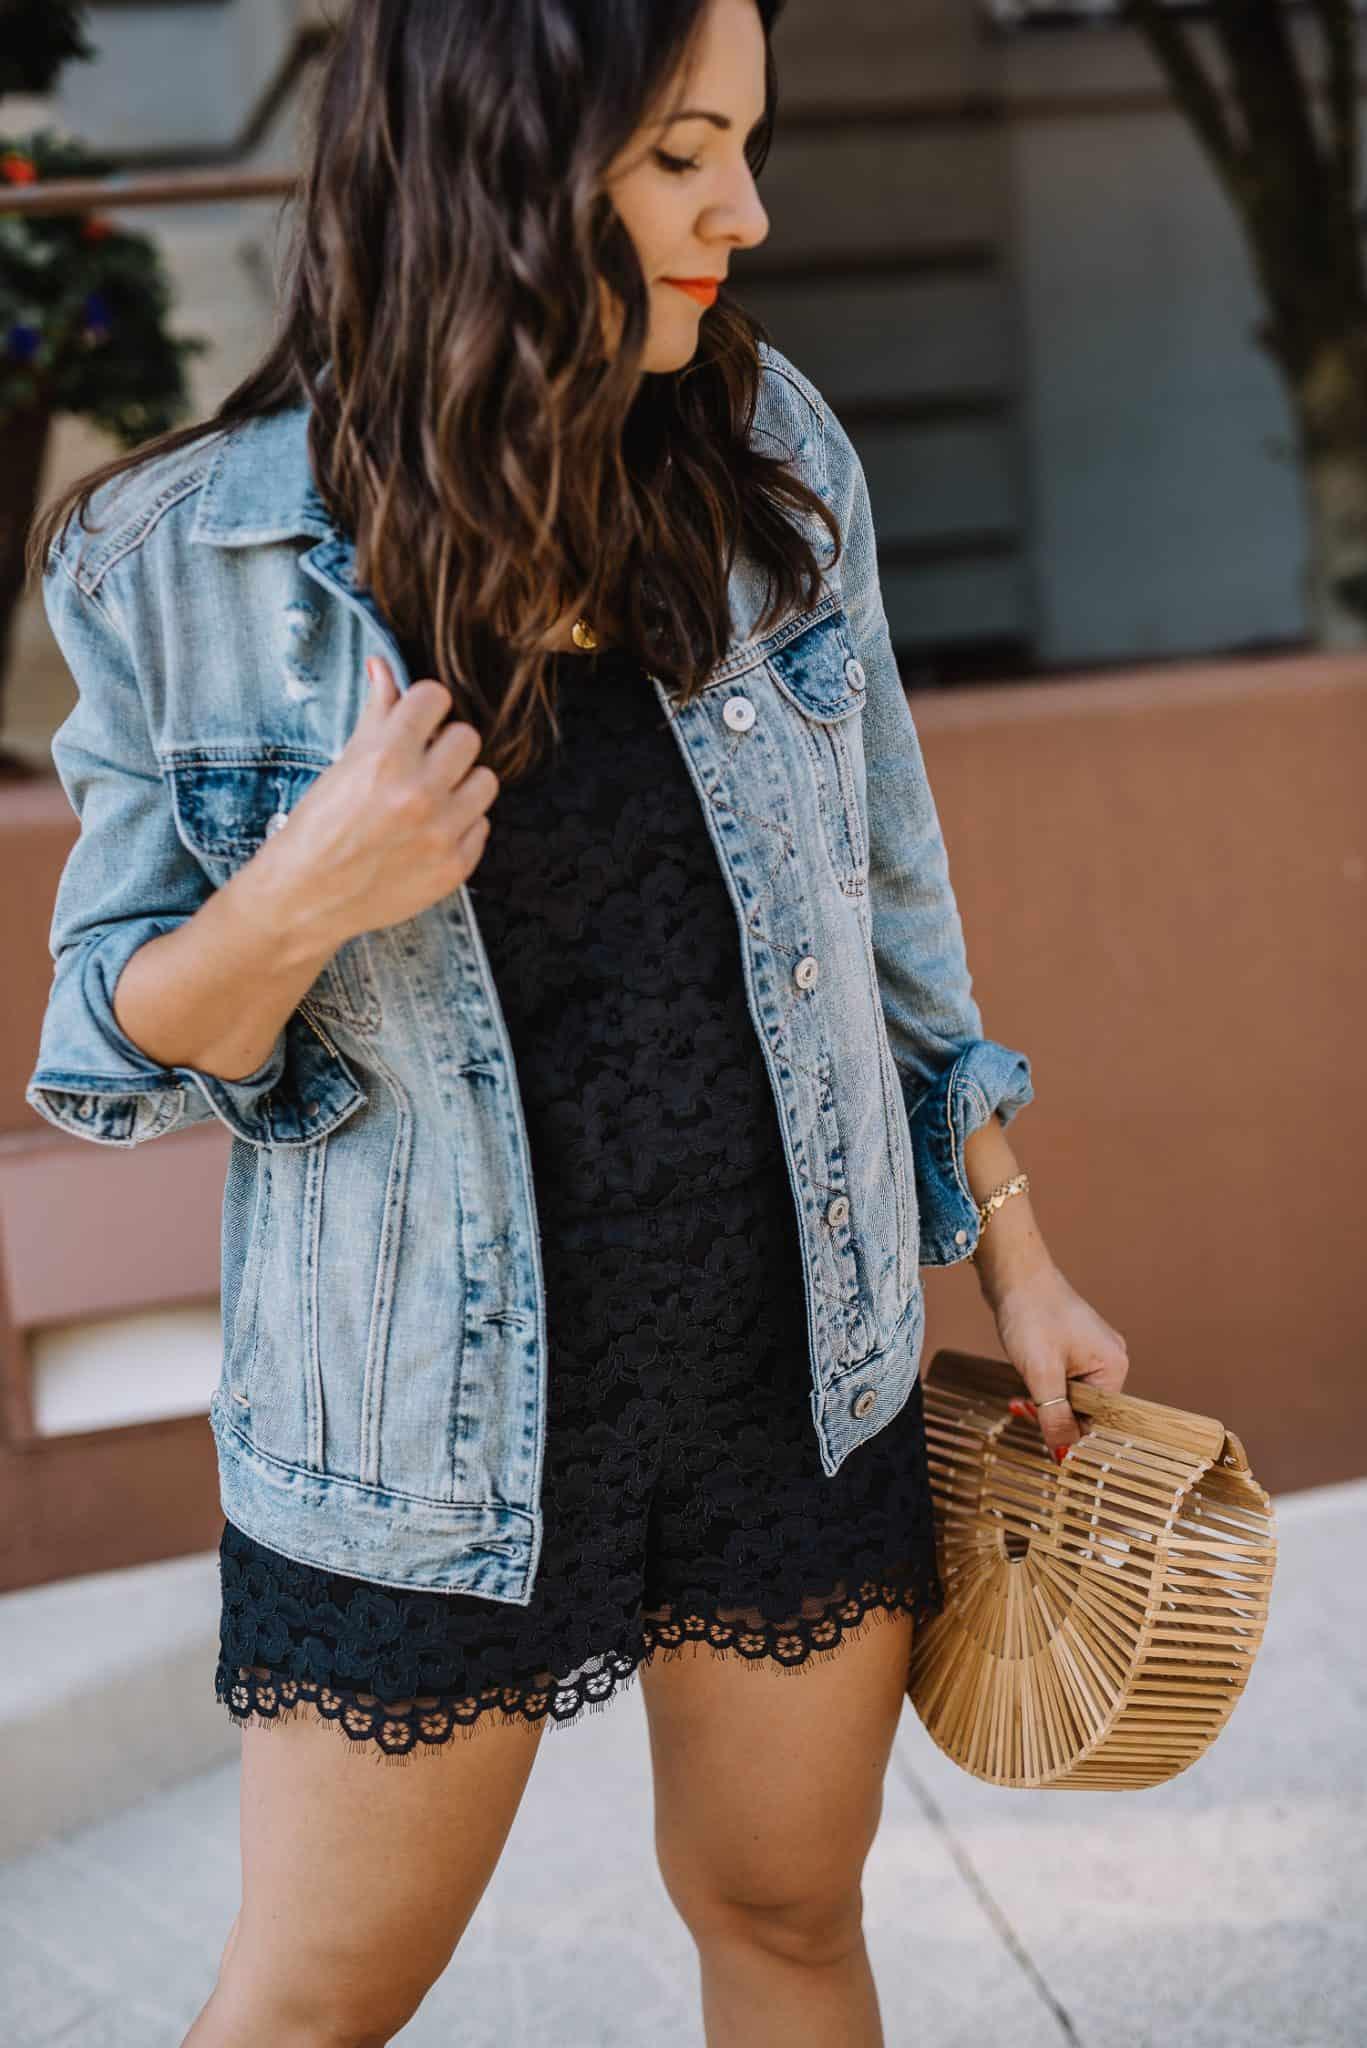 abercrombie girlfriend denim jacket